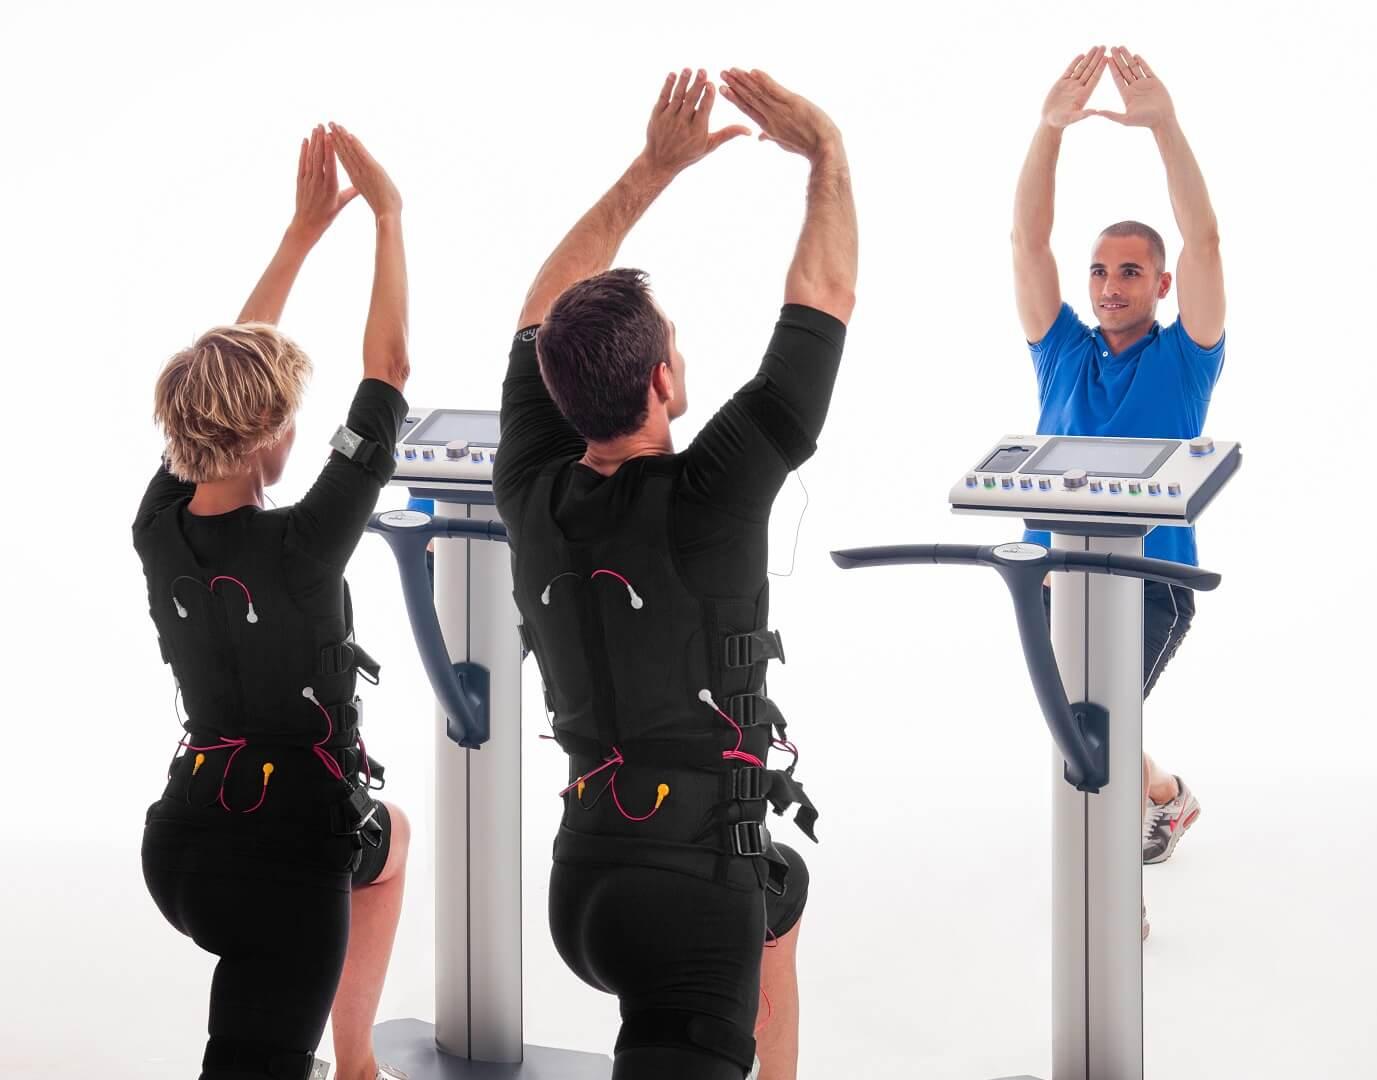 ems personaltraining elixia vitalclub hamburg fitnessstudio langenhorn. Black Bedroom Furniture Sets. Home Design Ideas